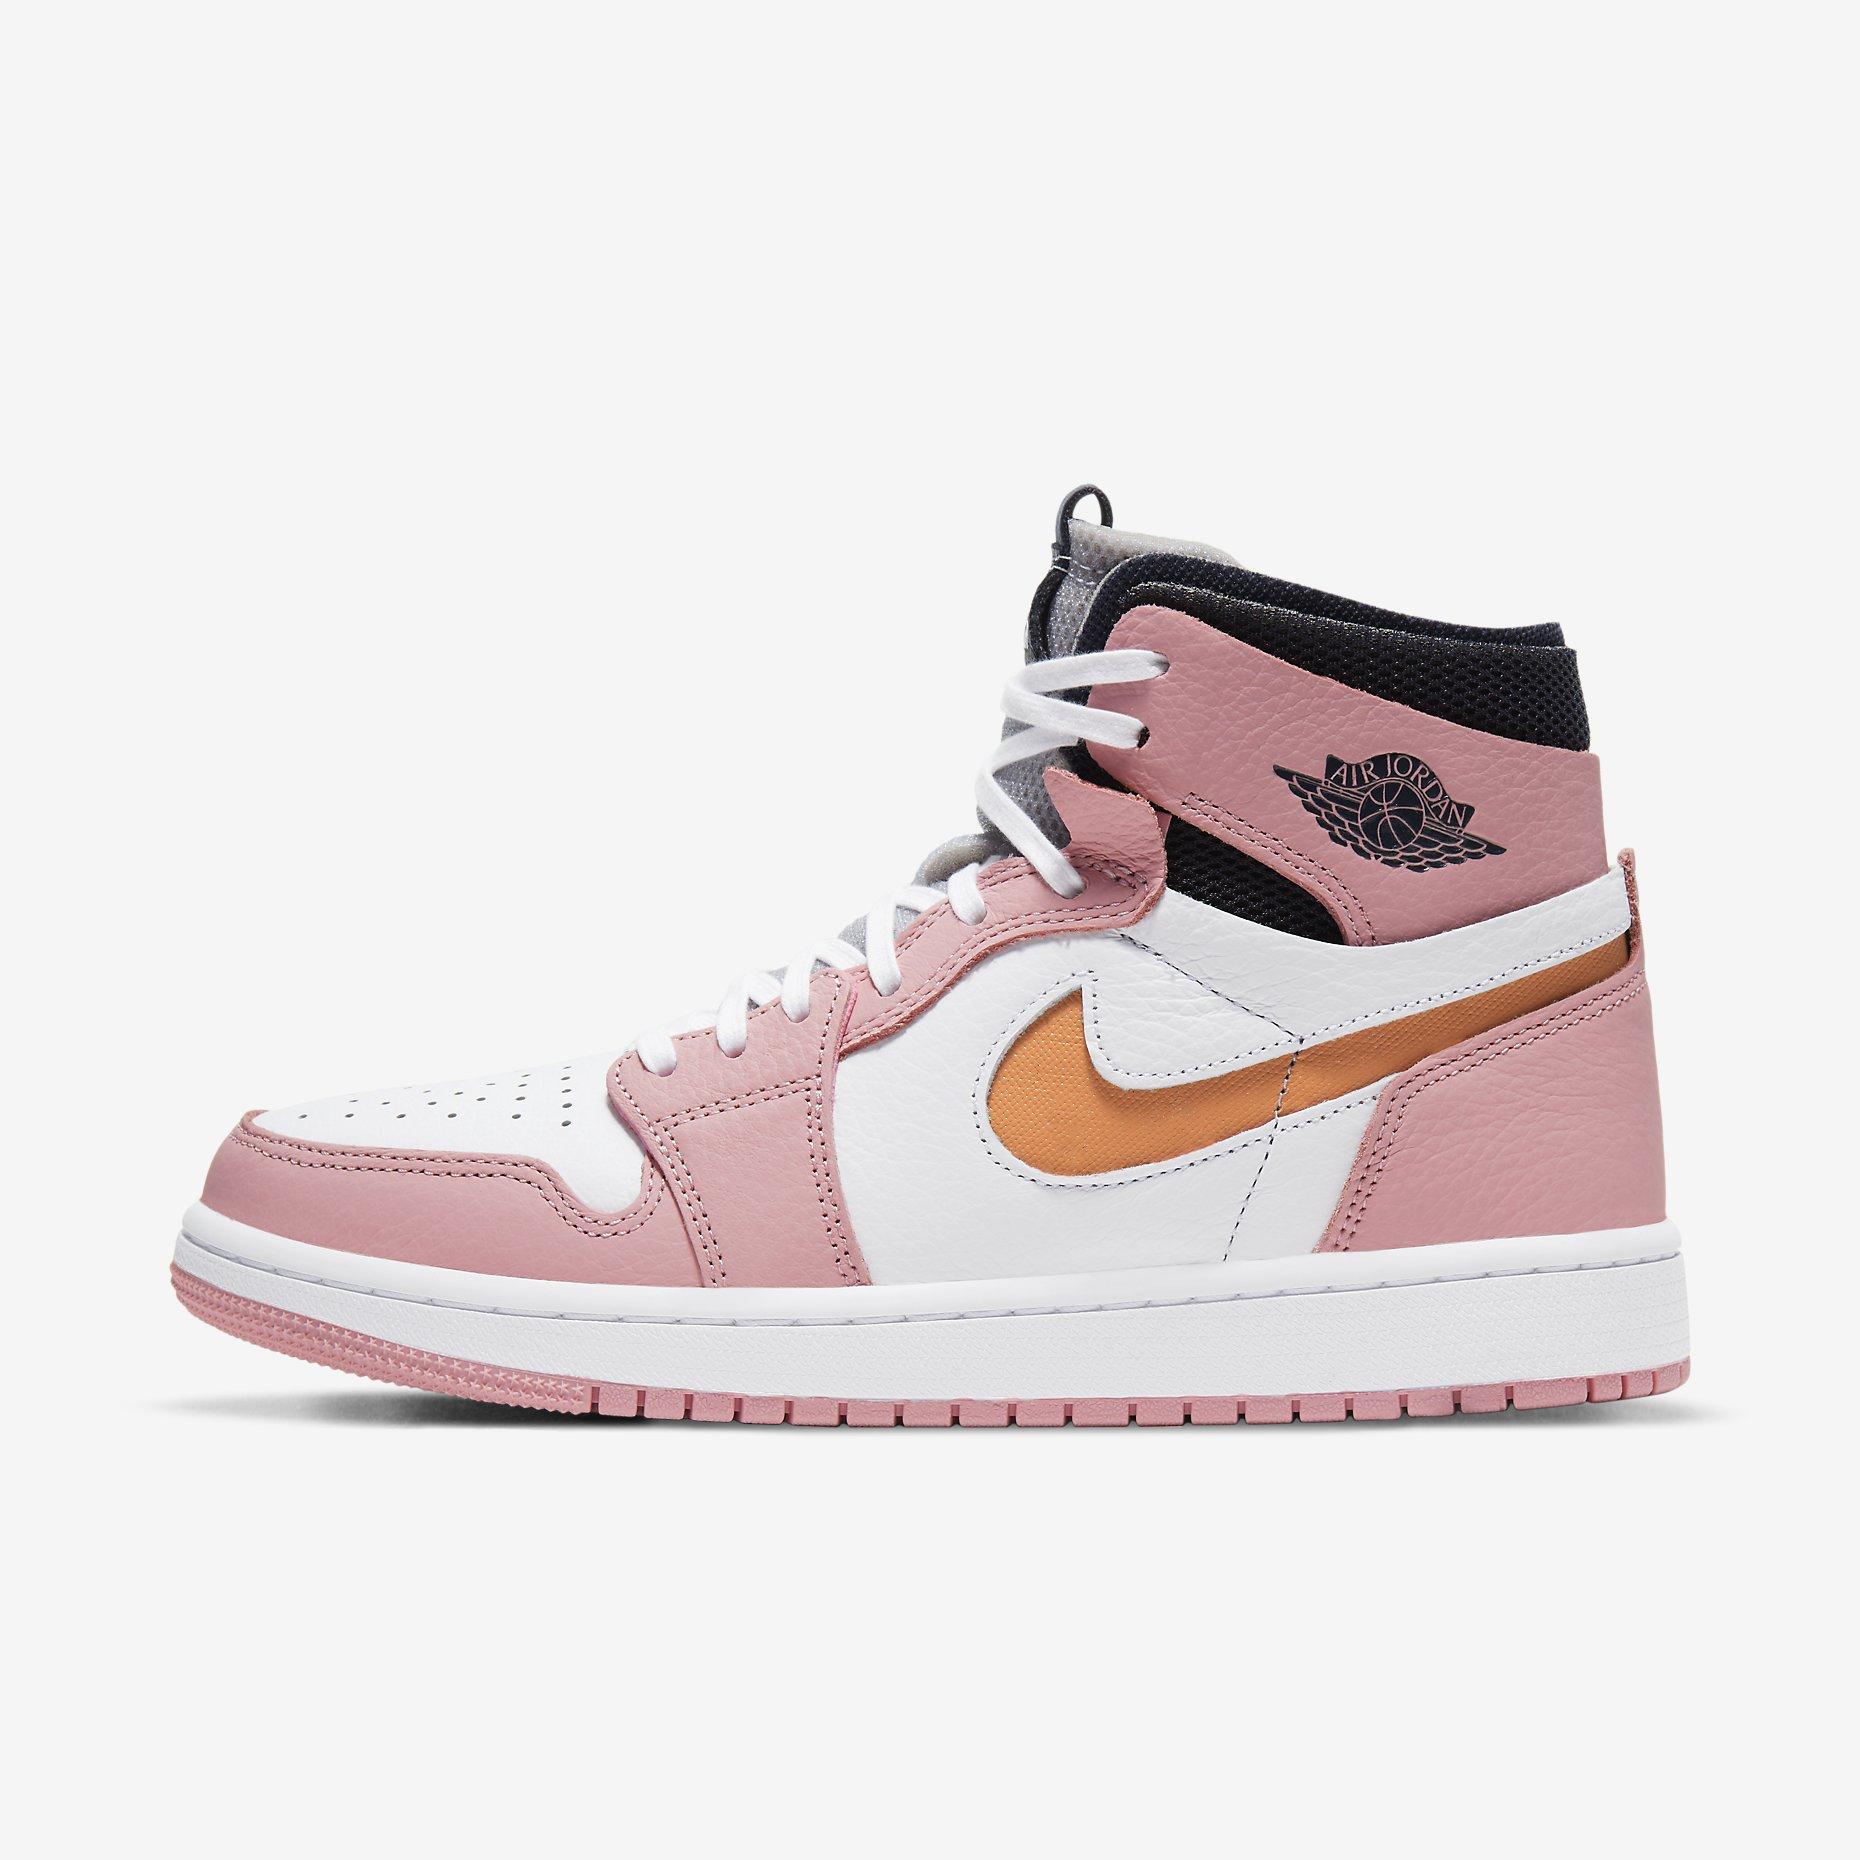 Women's Air Jordan 1 Zoom Air Comfort 'Pink Glaze'}